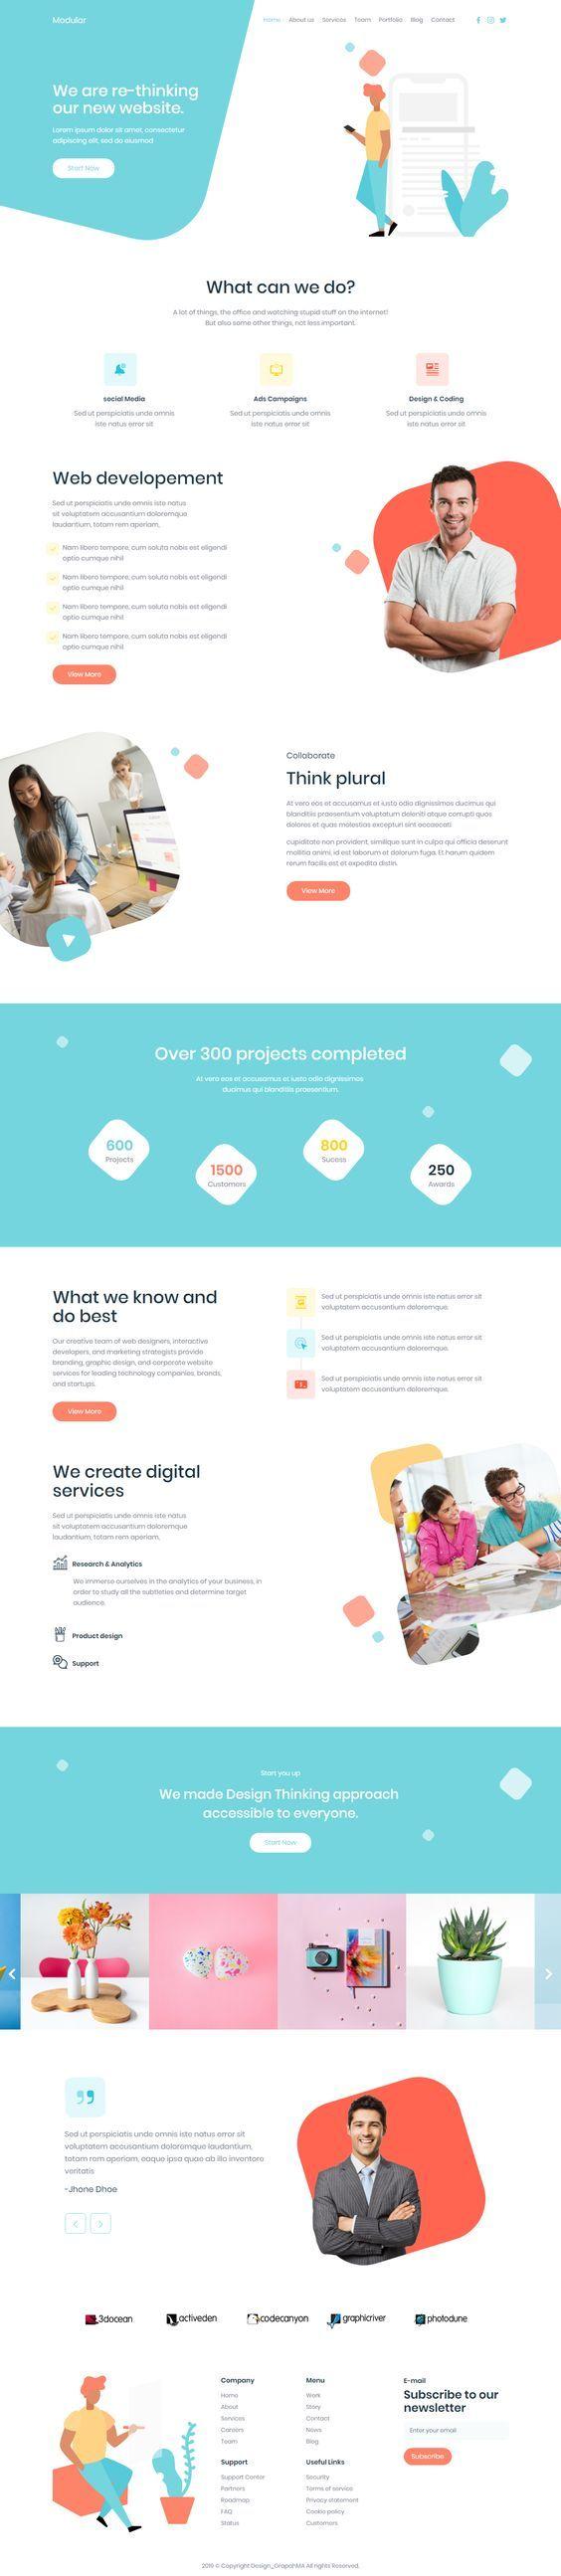 Modular Creative Html Template In 2020 Web Layout Design Web Design Inspiration Book Design Layout